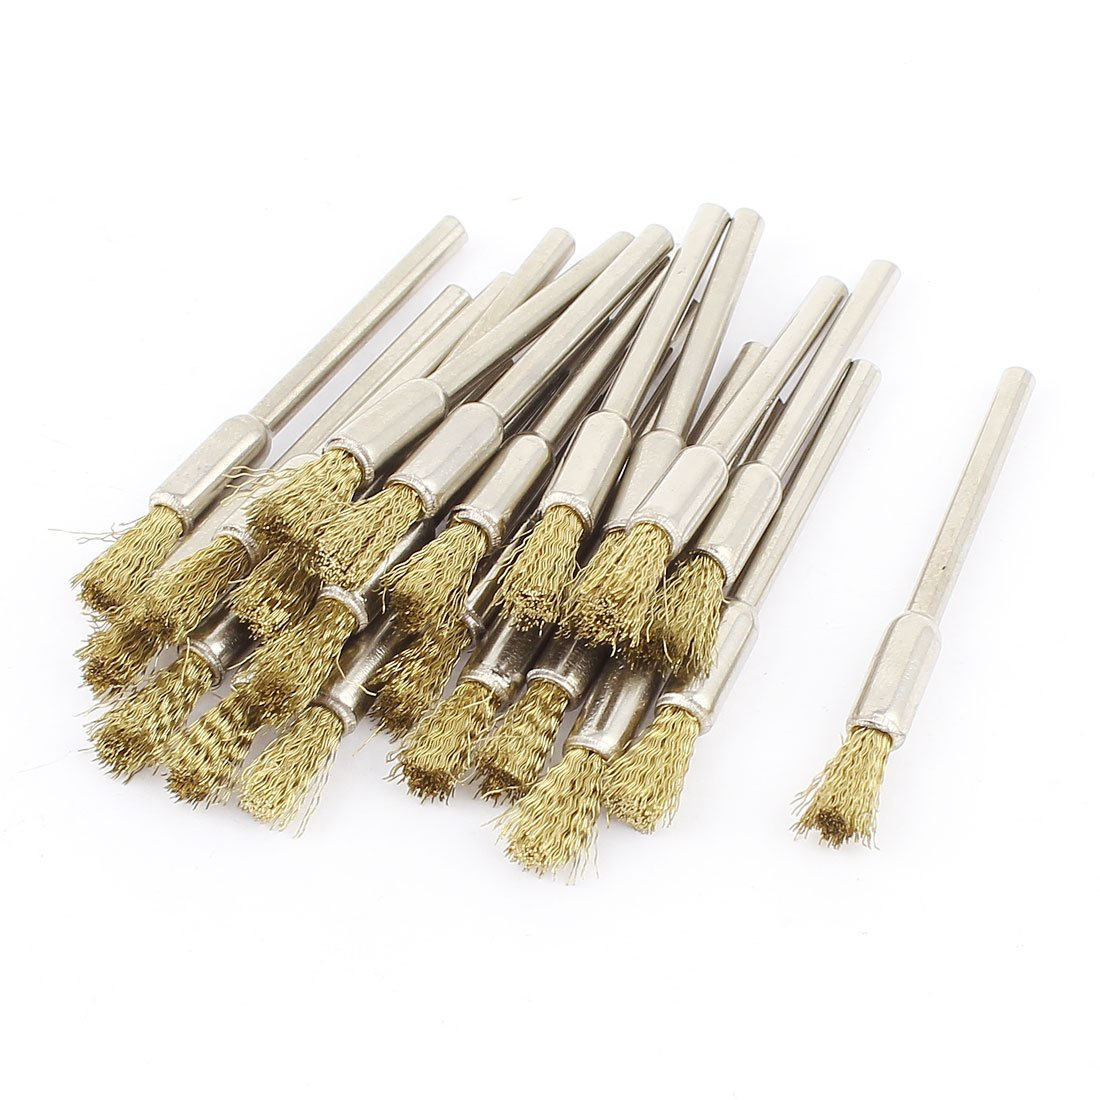 Sourcingmap 1/8 Inch Mandrel Gold Tone Wire Pen Polishing Brush 22pcs a14110600ux0721